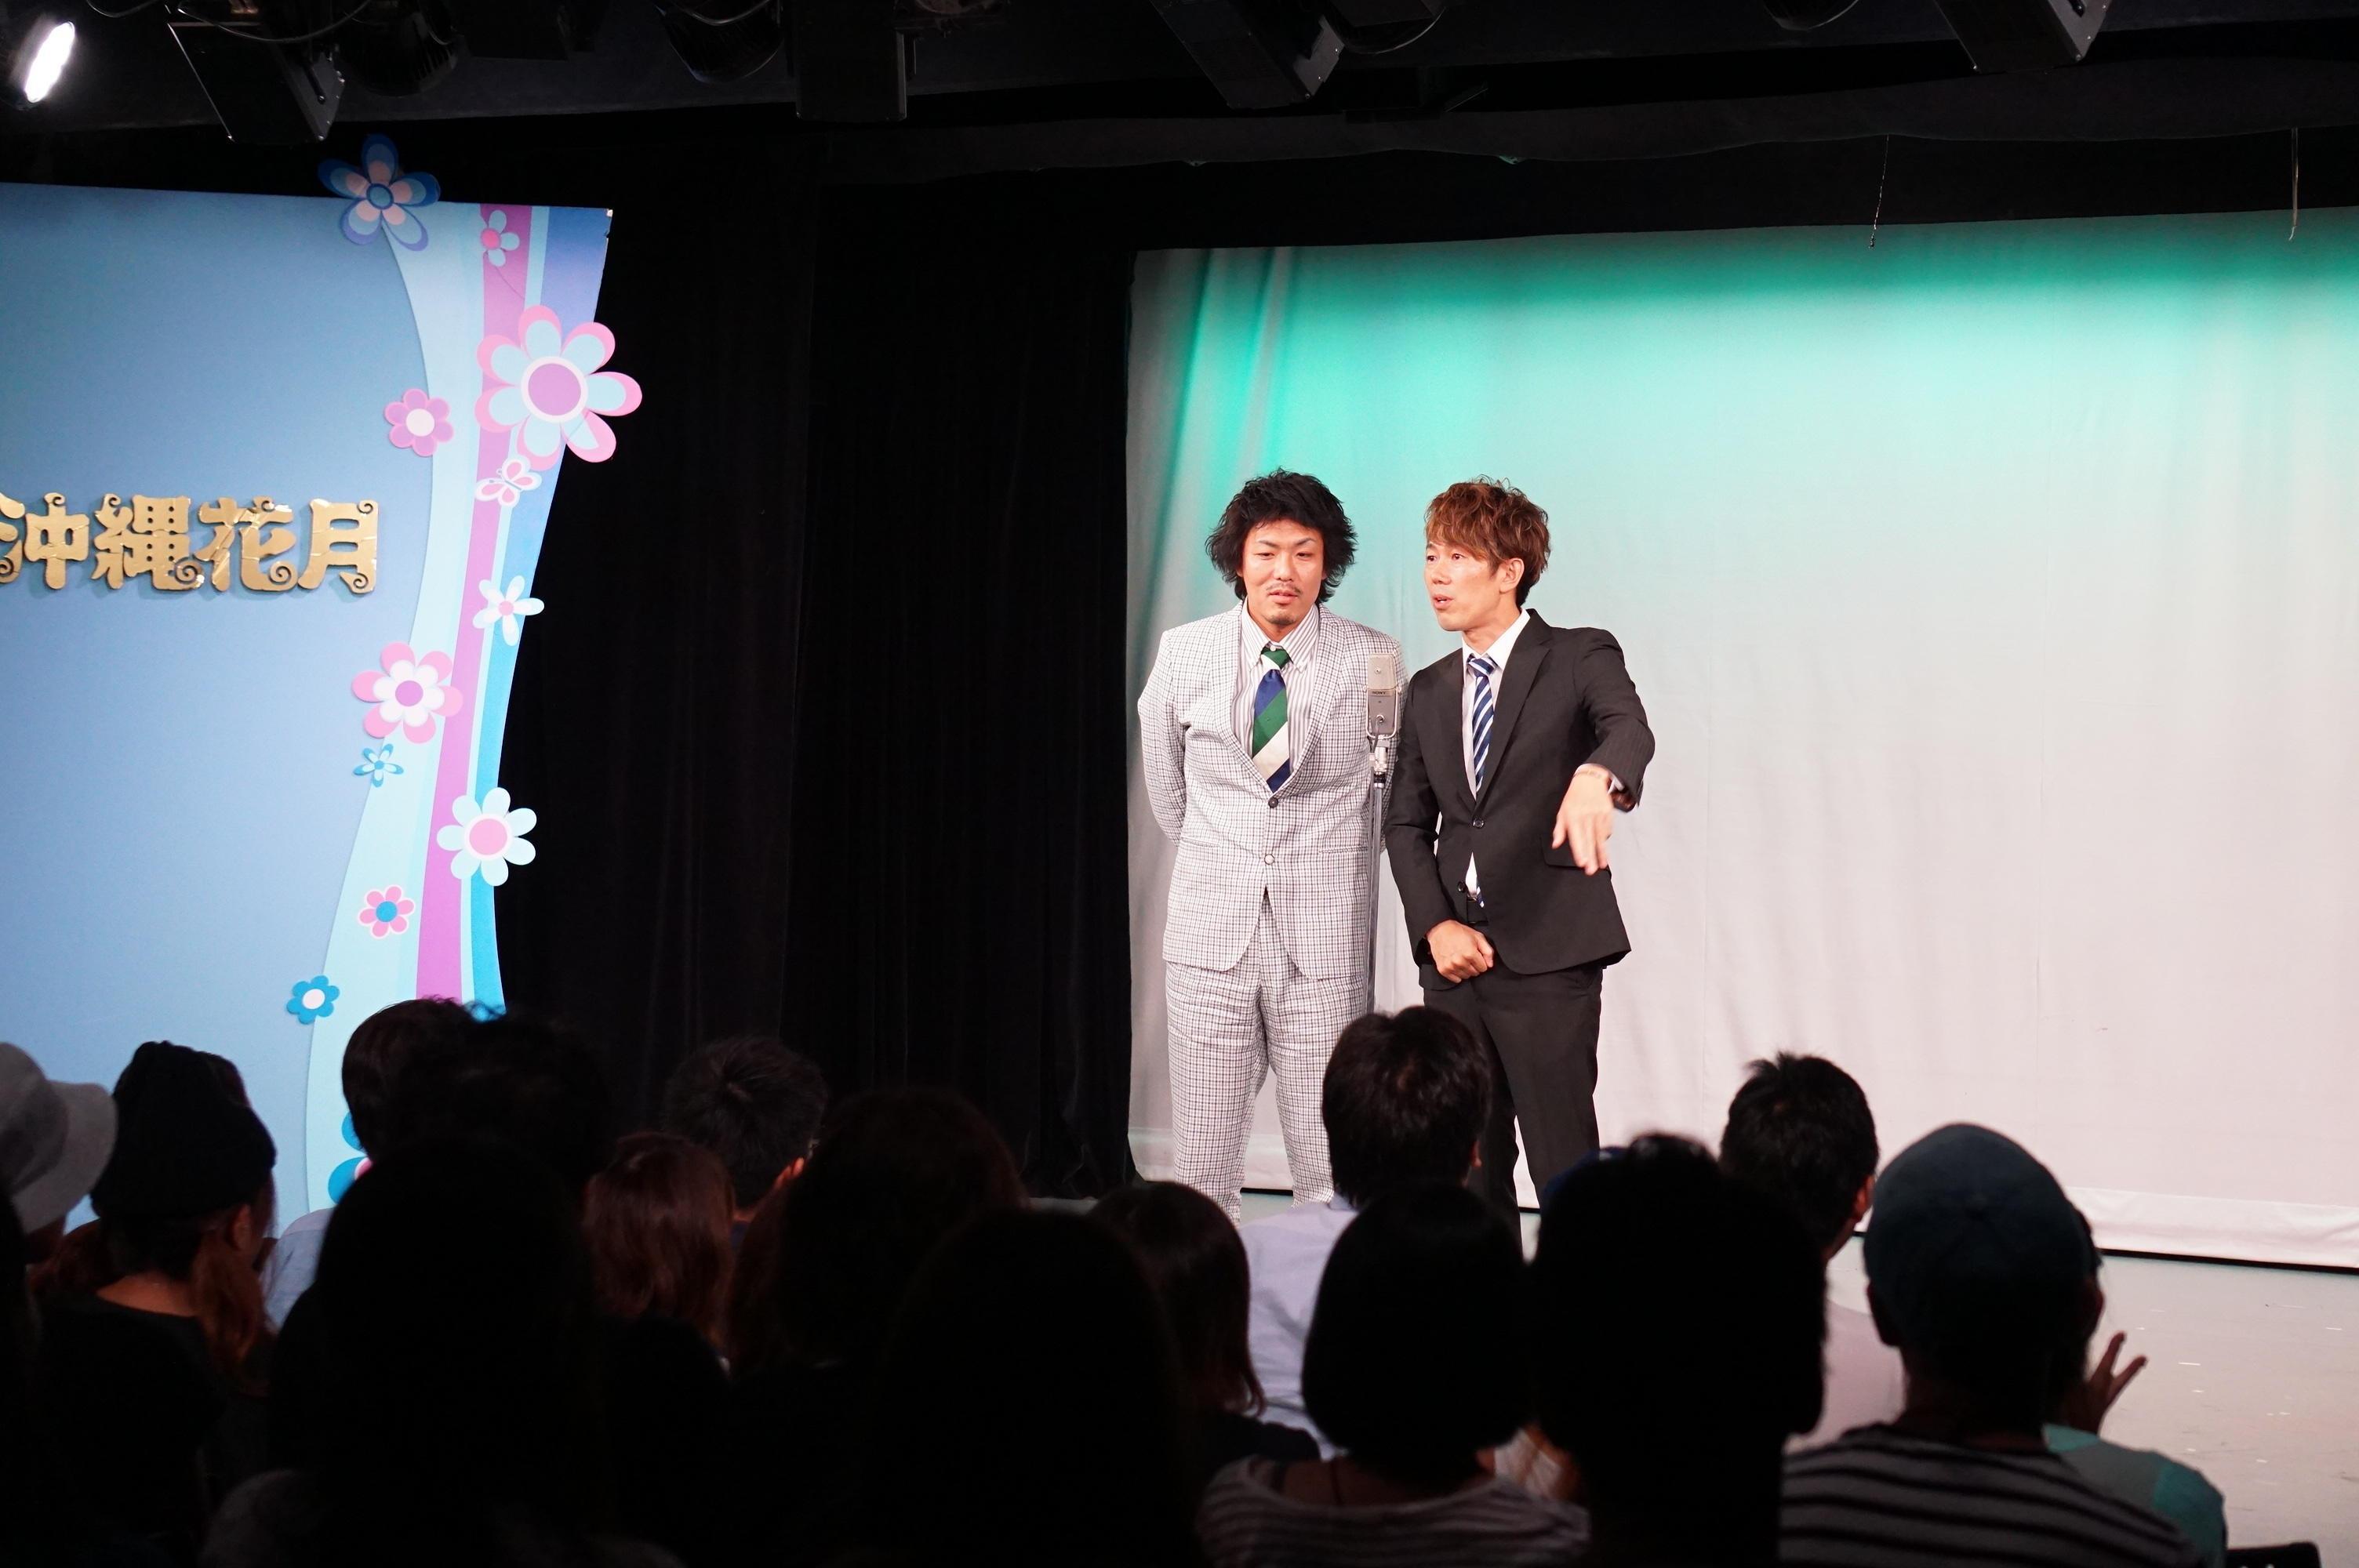 http://news.yoshimoto.co.jp/20160930202354-2a647e48117702745b740f0d39b1b0b05e83b500.jpg